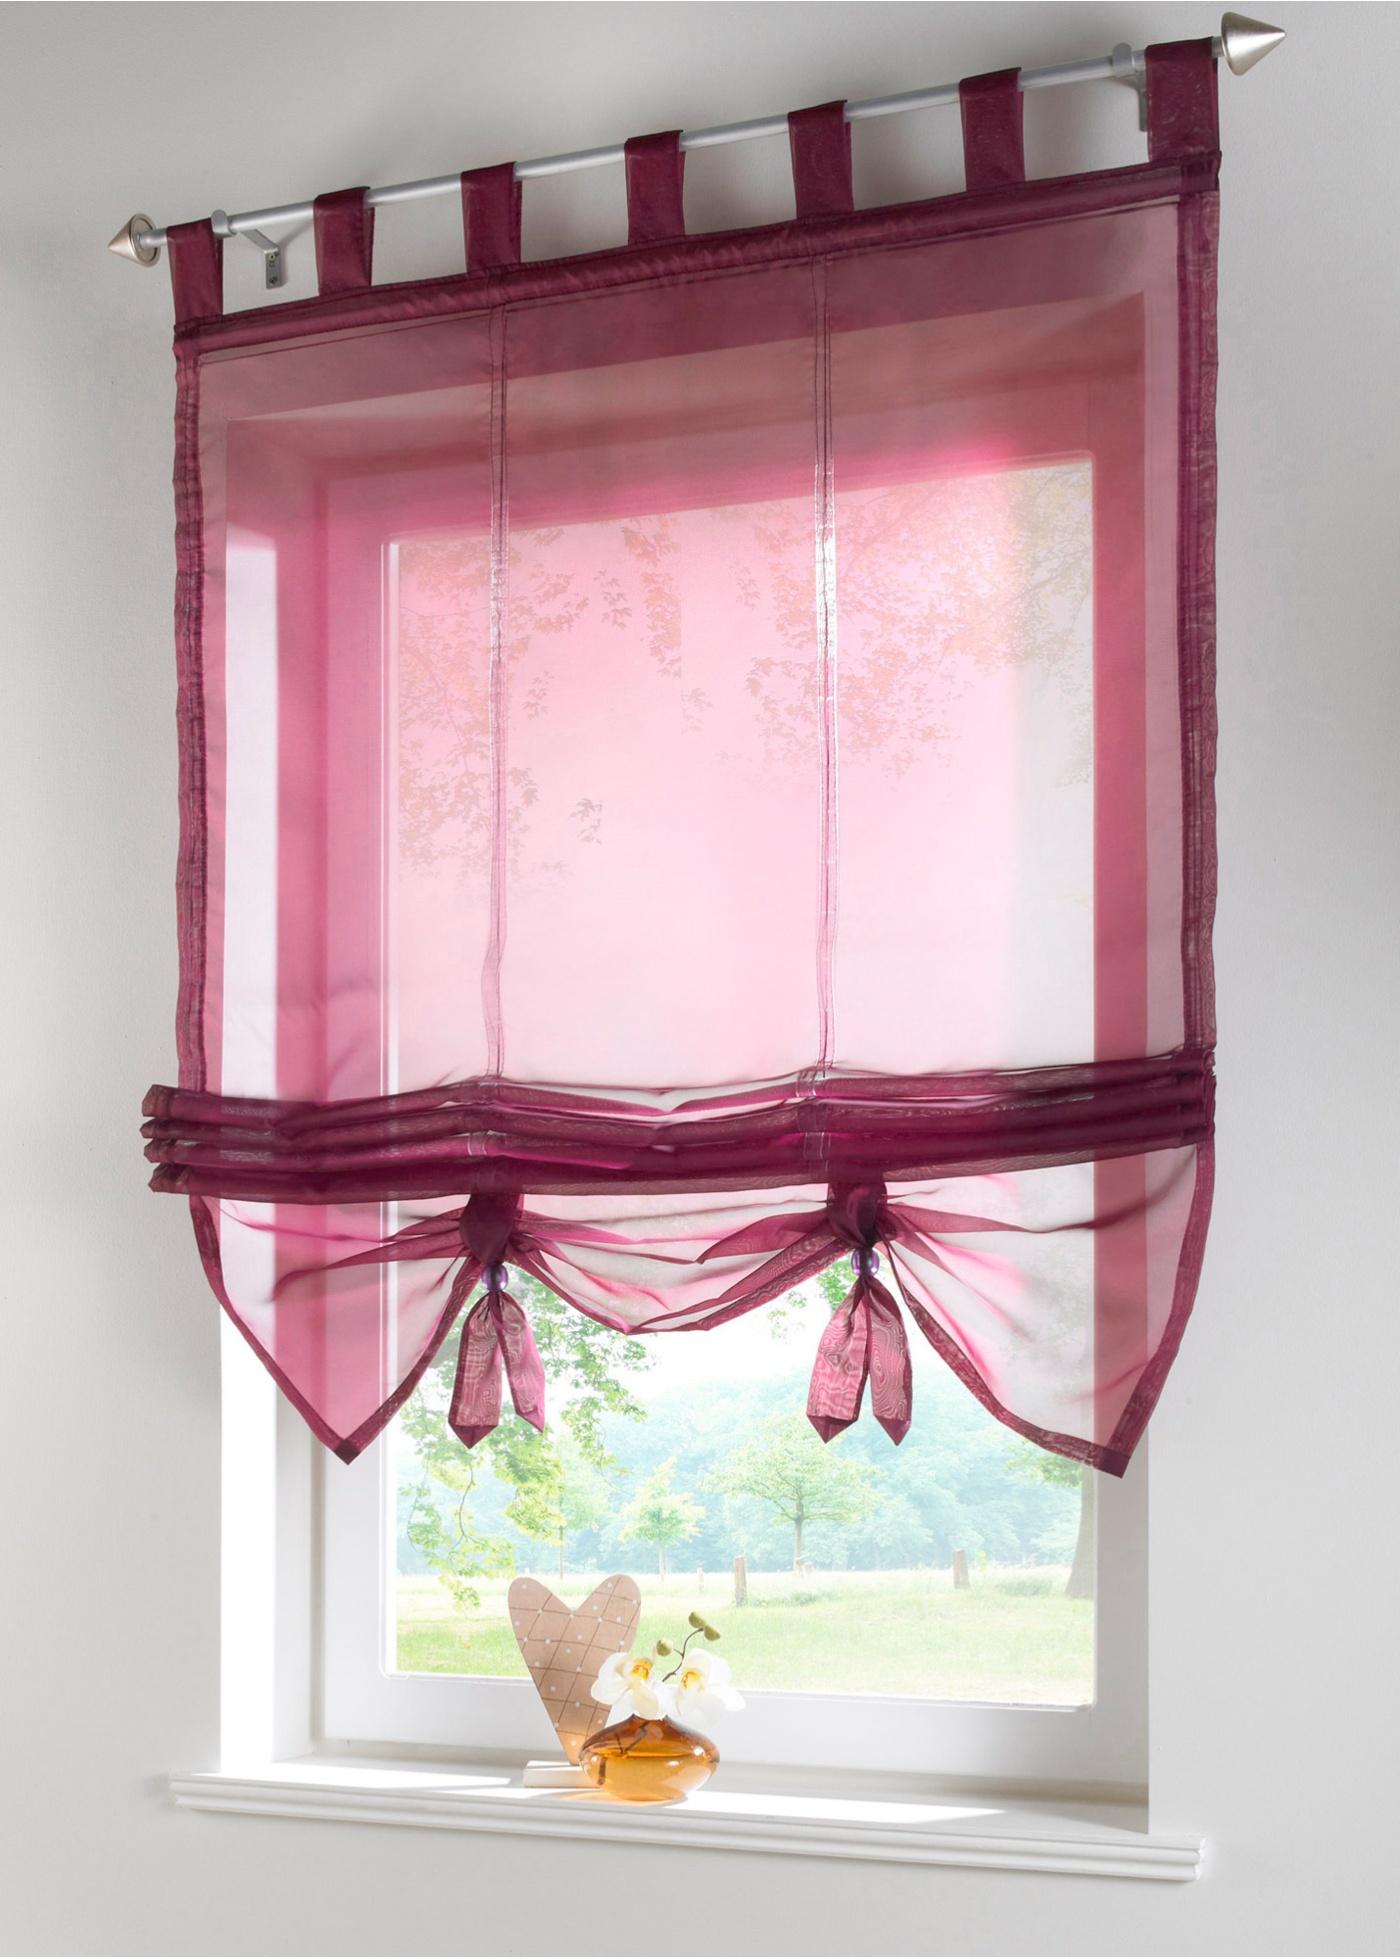 bonprix gardinen sonstige preisvergleiche. Black Bedroom Furniture Sets. Home Design Ideas